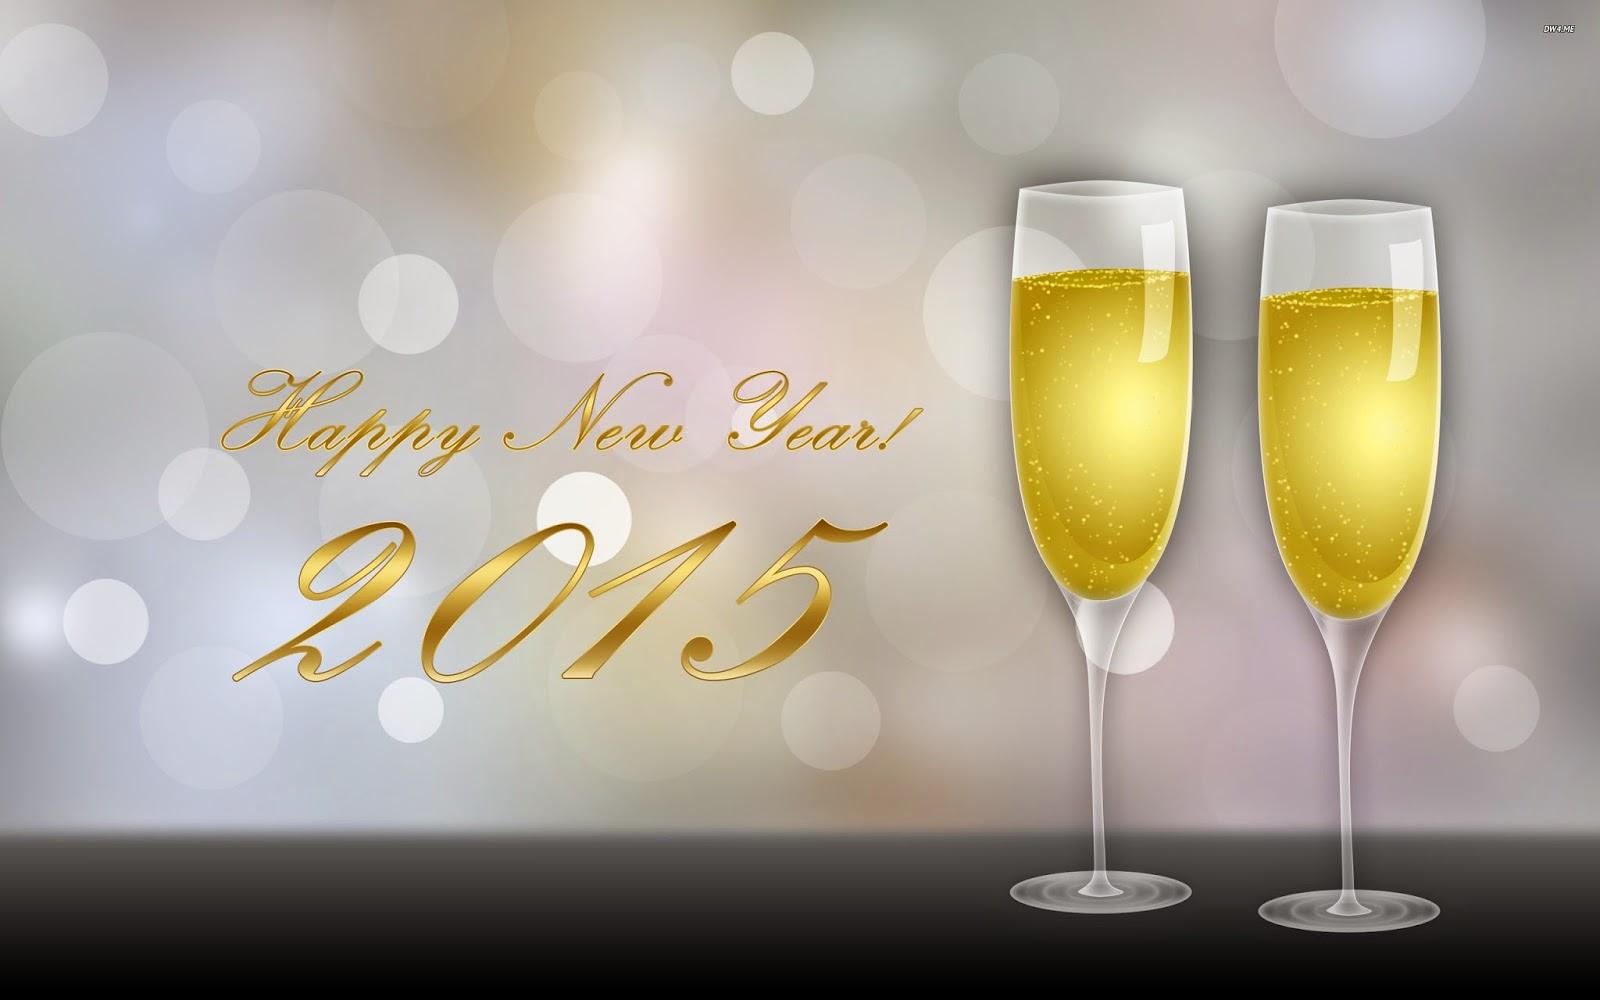 صور خلفيات Happy New Year